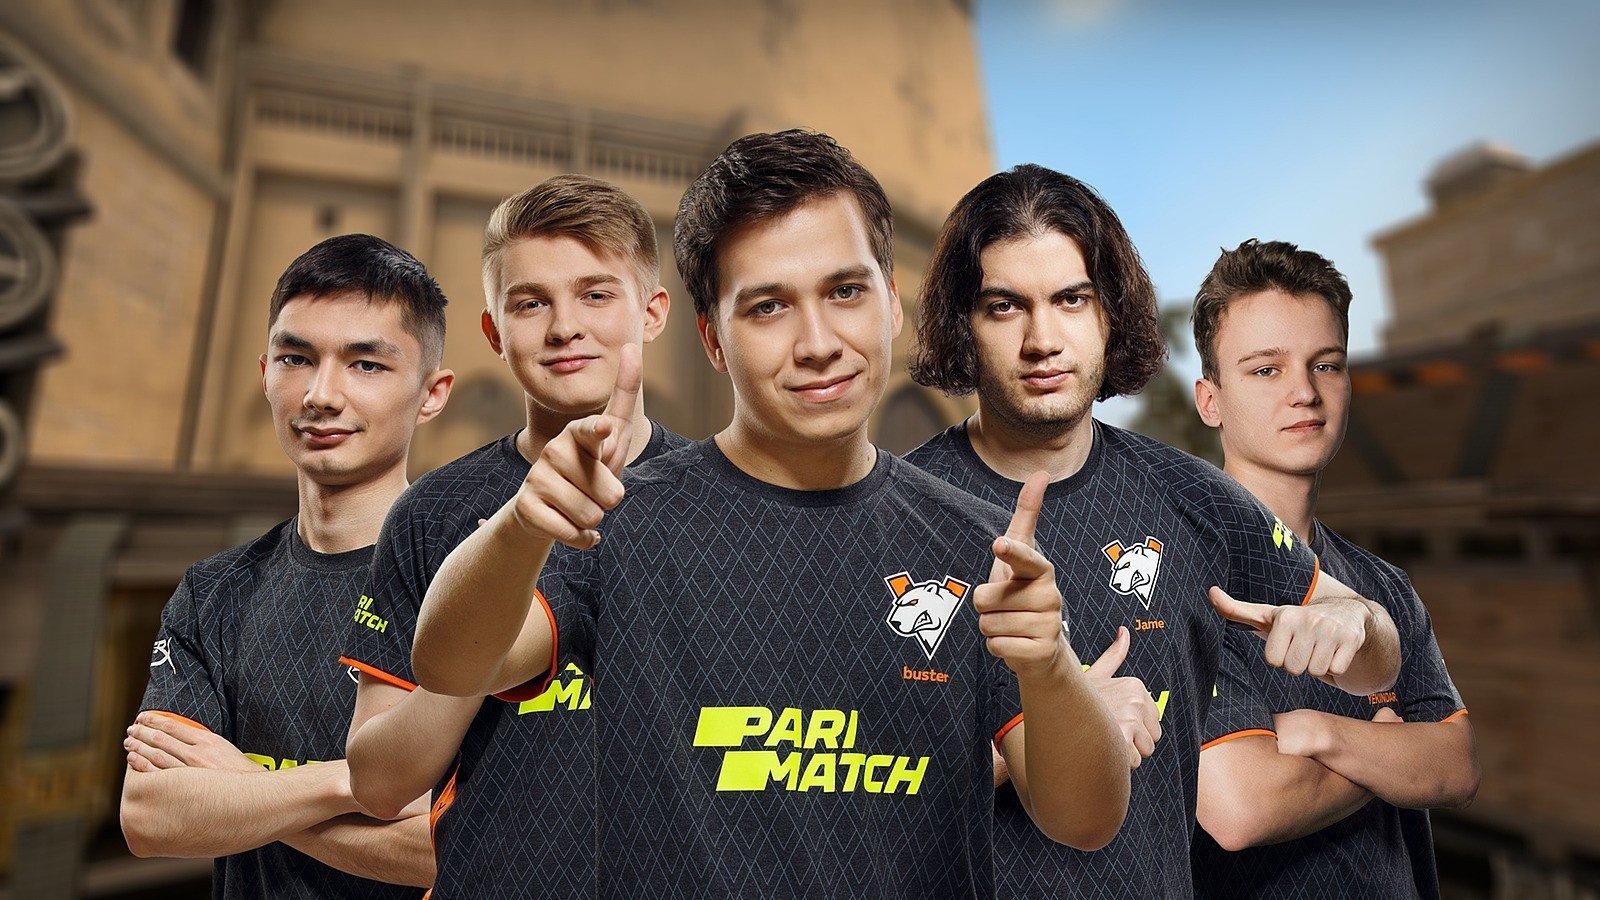 Virtuspro обыграла Evil Geniuses на ESL Pro League 13